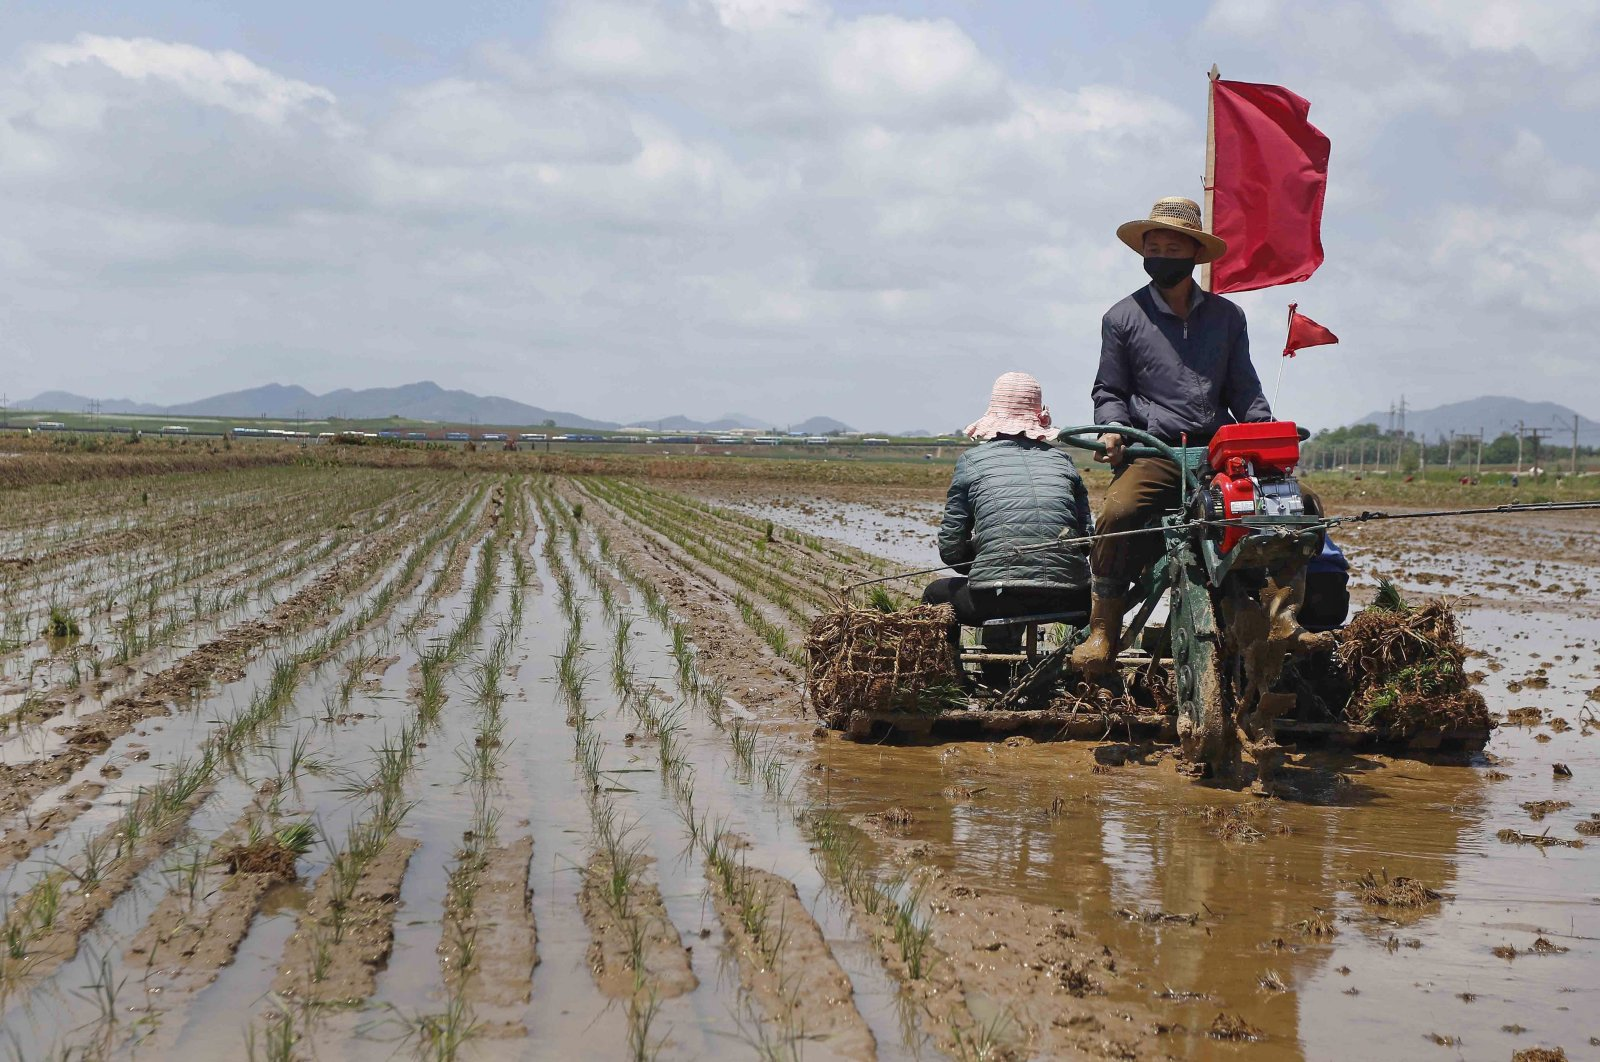 Farmers plant rice at the Namsa Co-op Farm in the Rangnang district in Pyongyang, North Korea, May 25, 2021. (AP Photo)